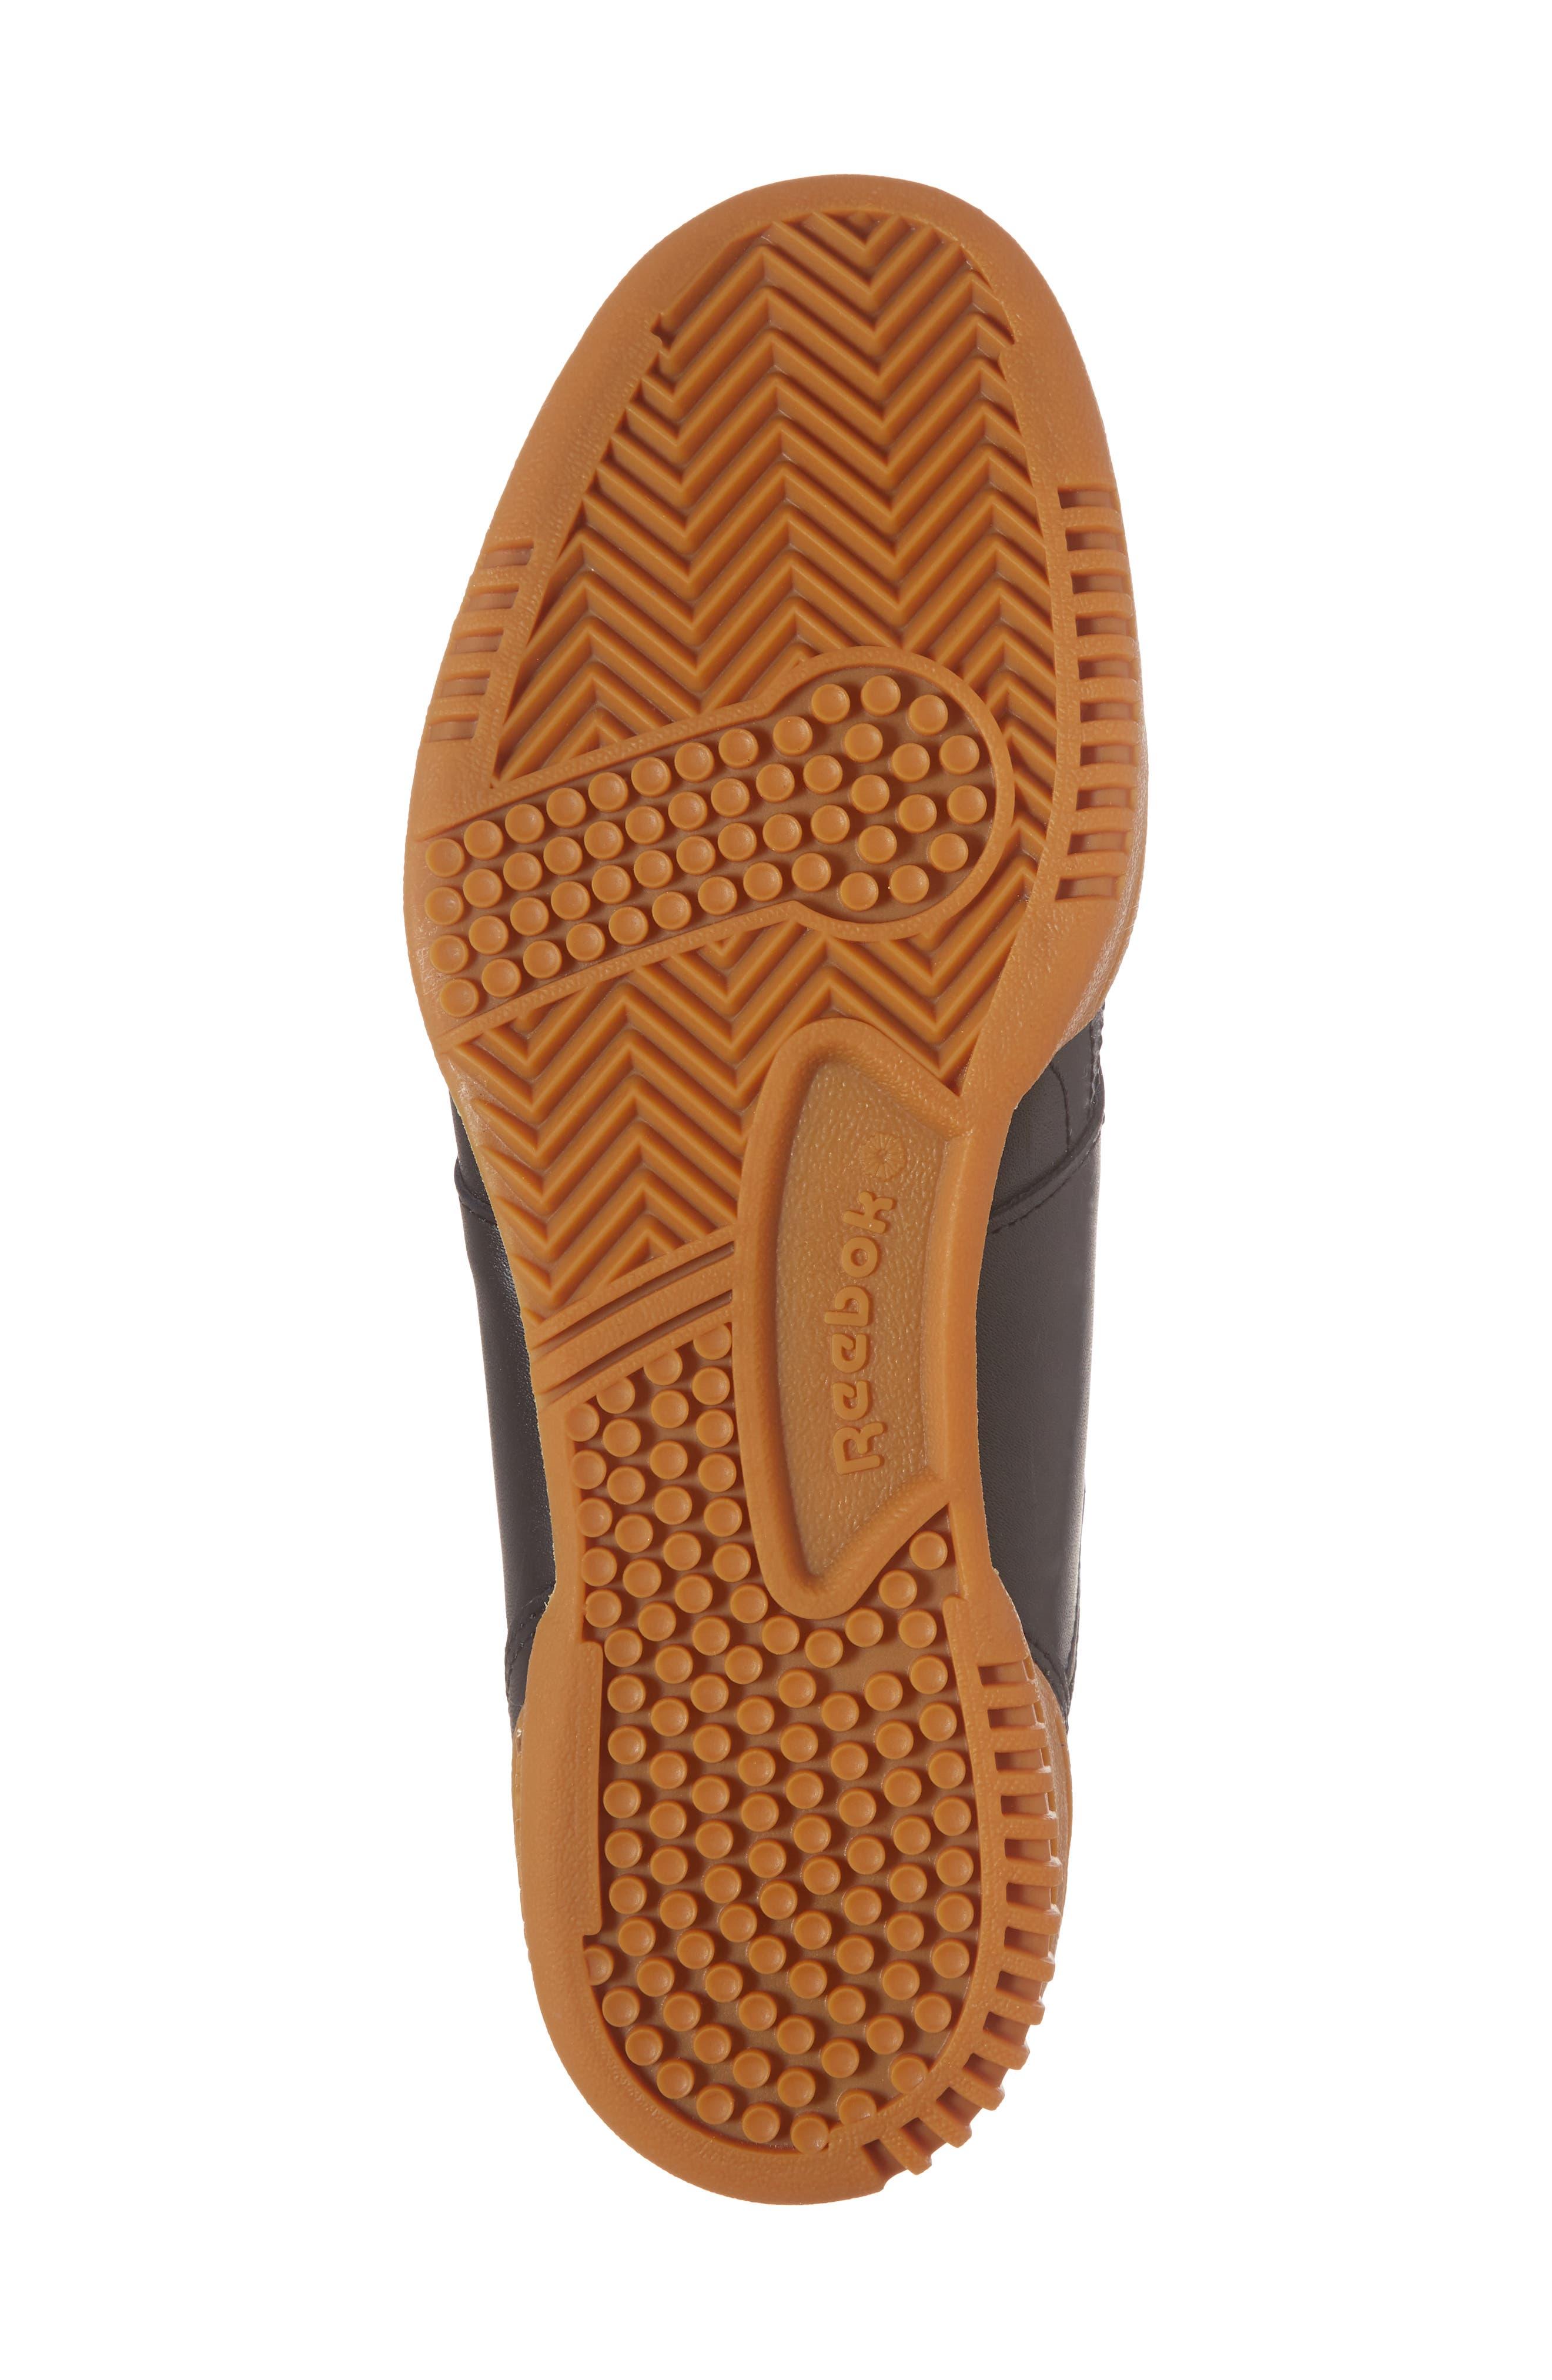 Workout Low Top Sneaker,                             Alternate thumbnail 6, color,                             Black